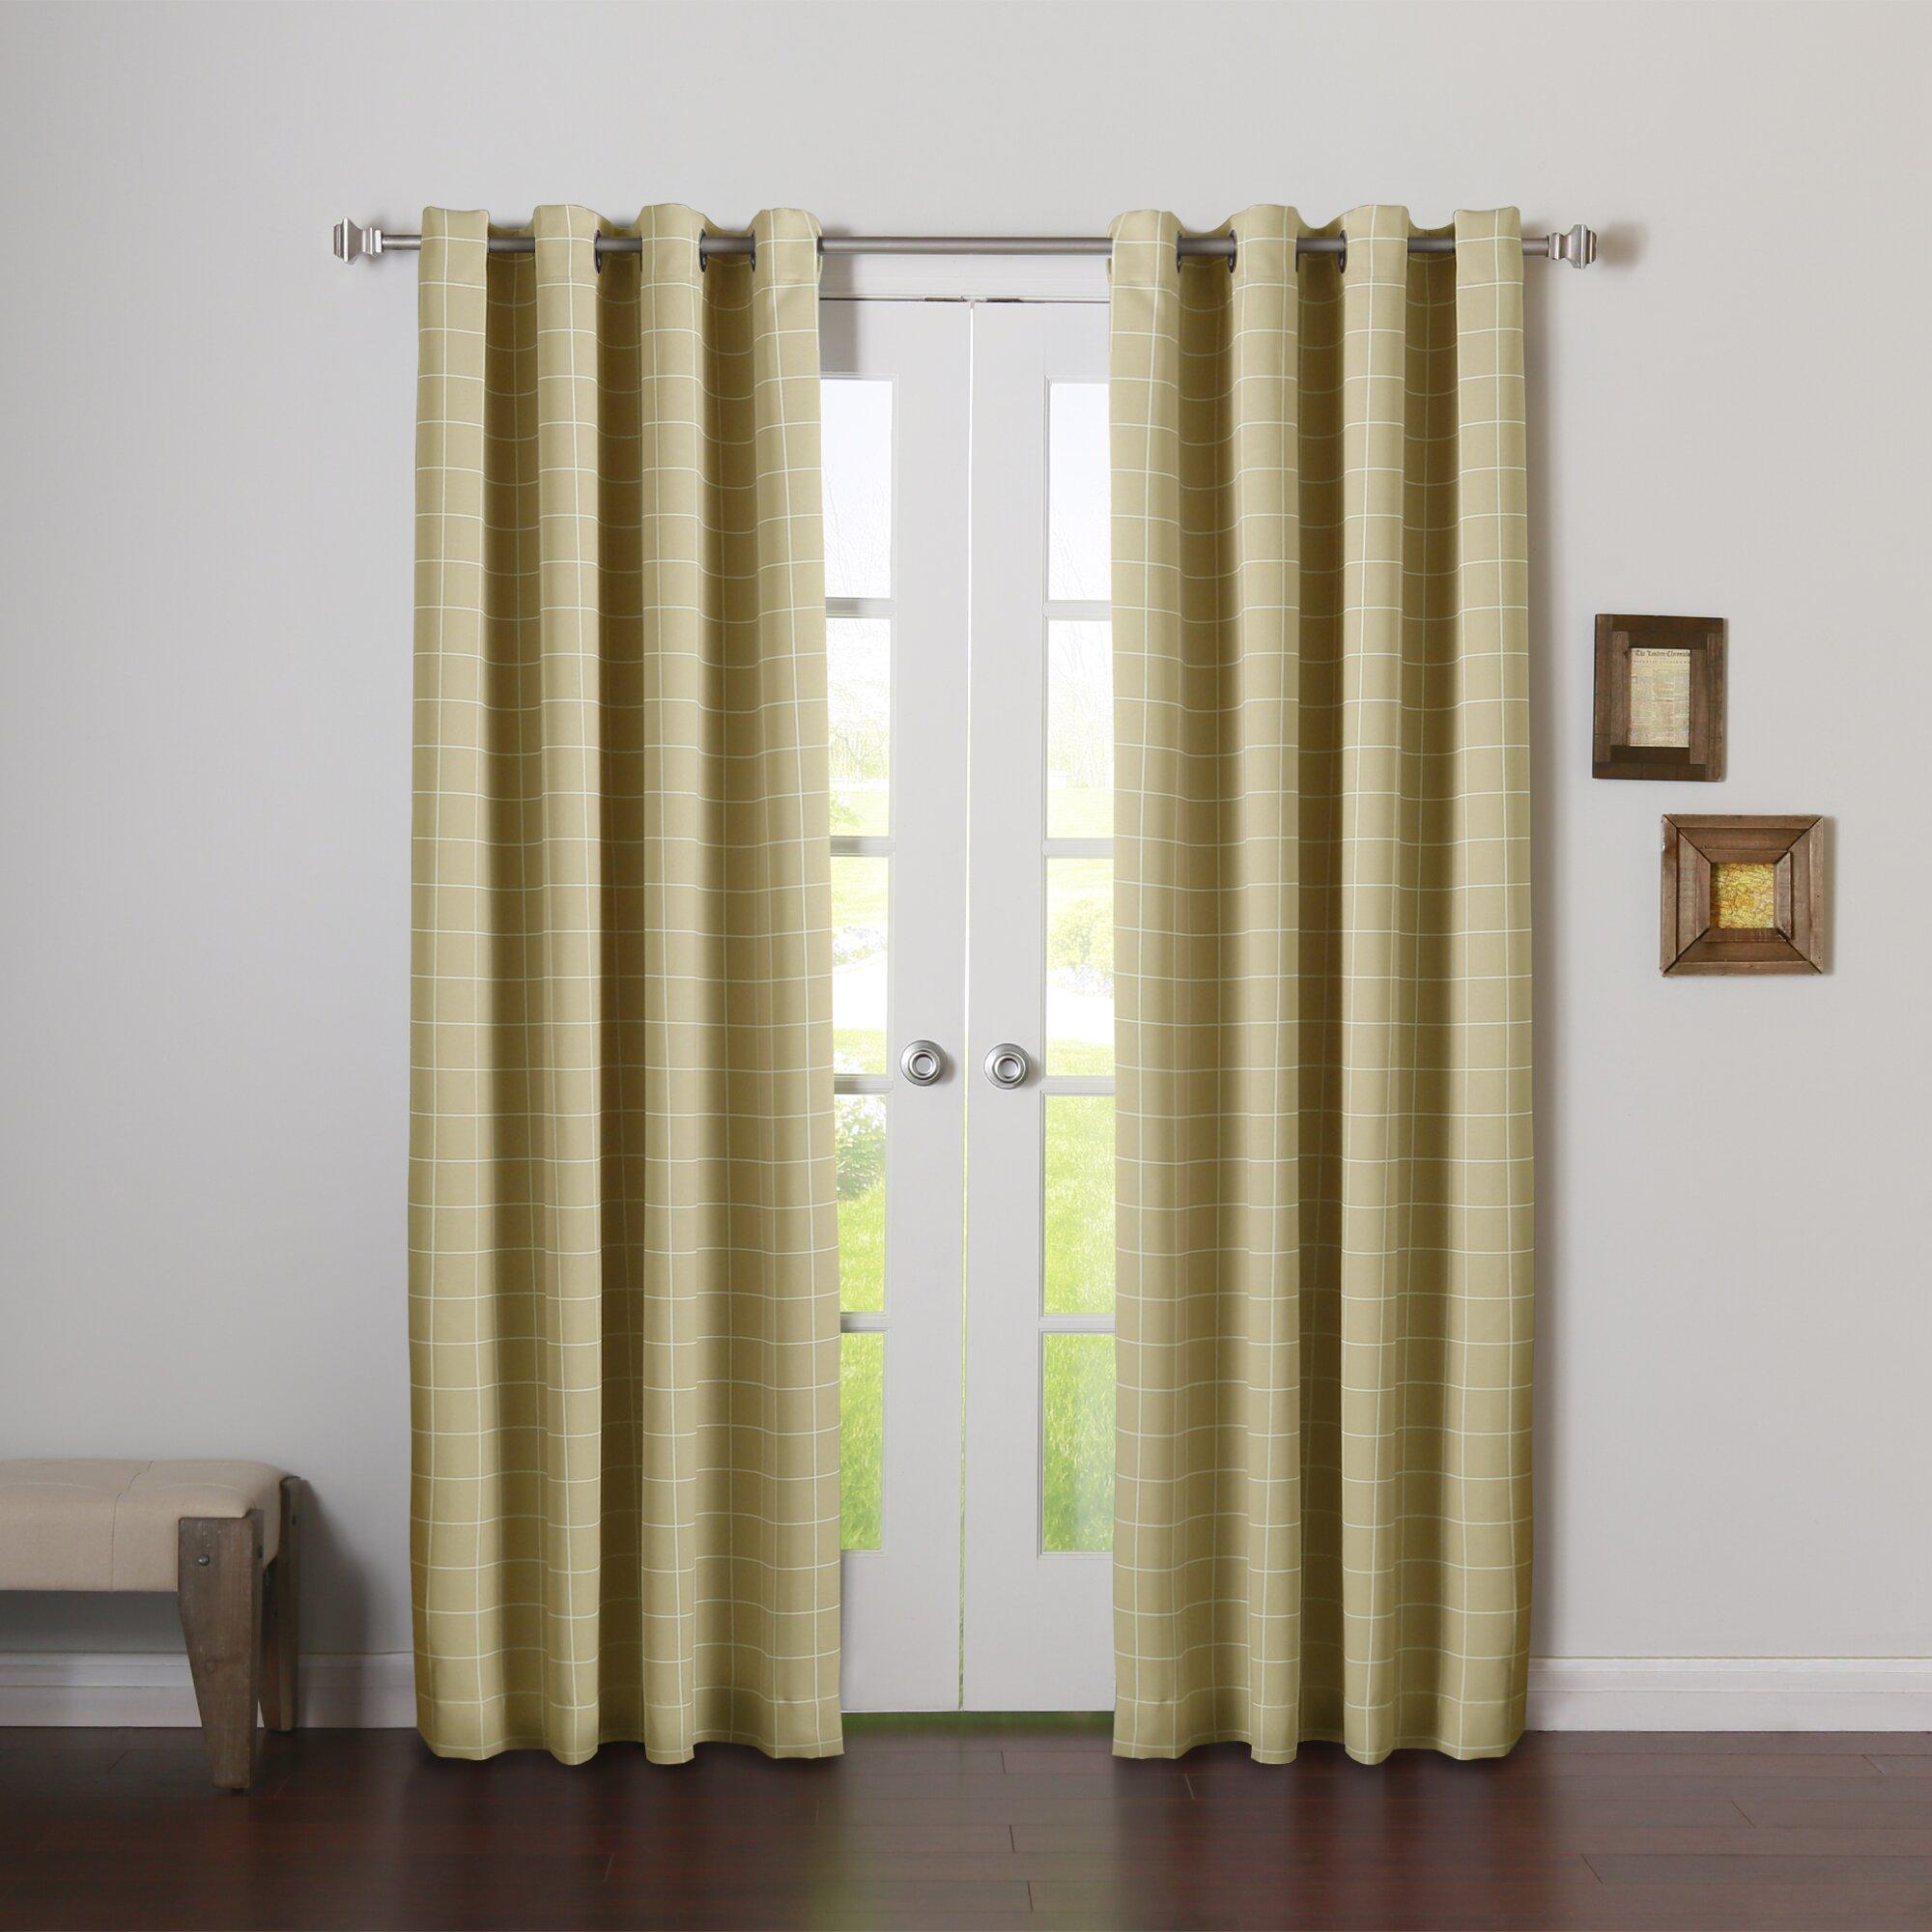 Best Home Fashion Inc Modern Plaid Room Darkening Curtain Panels Wayfair